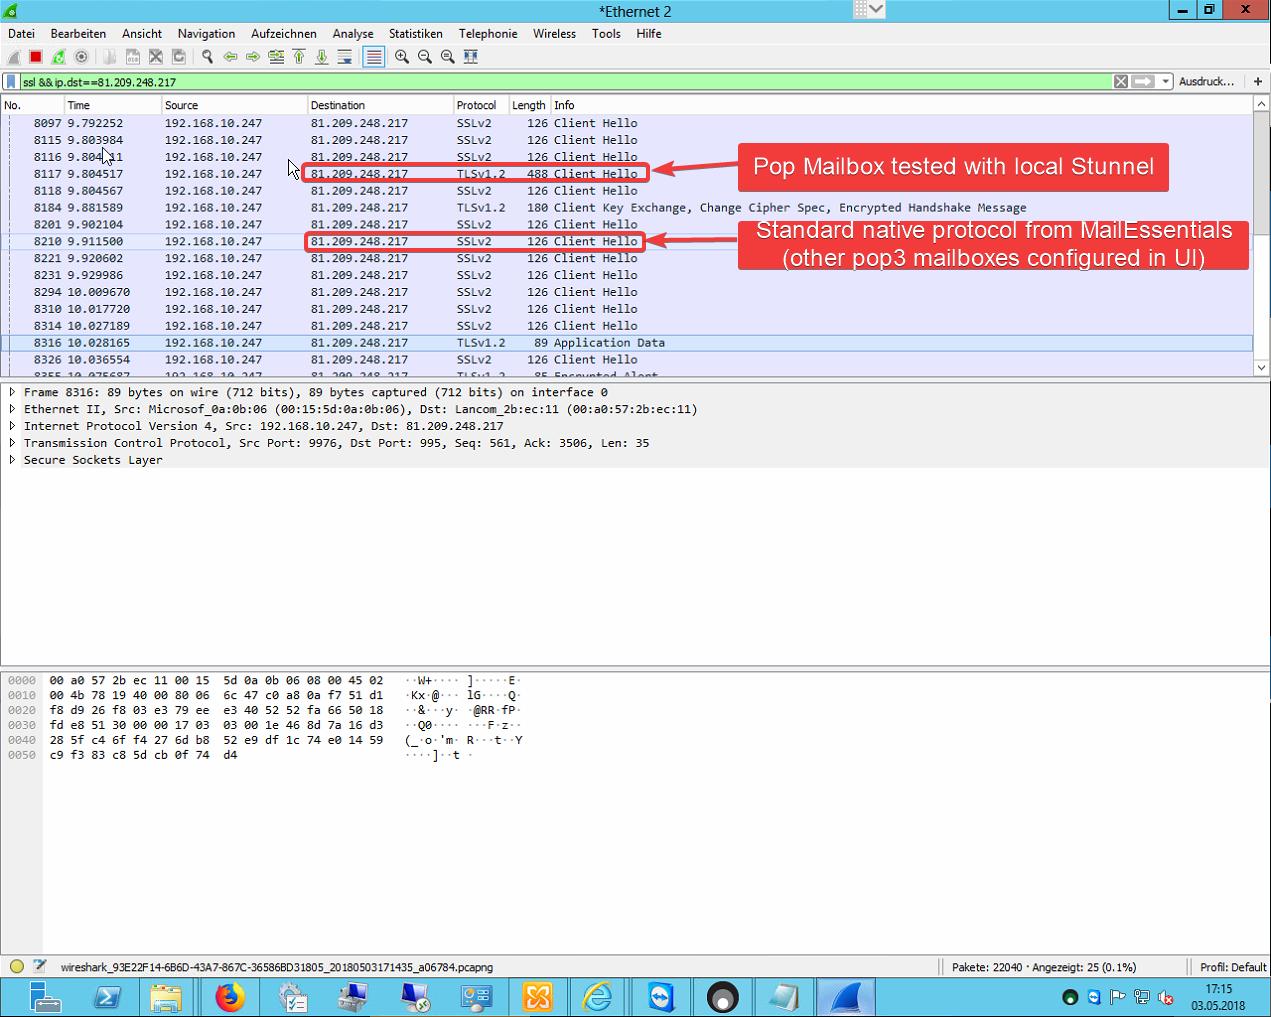 TLS1.2 in Wireshark using stunnel